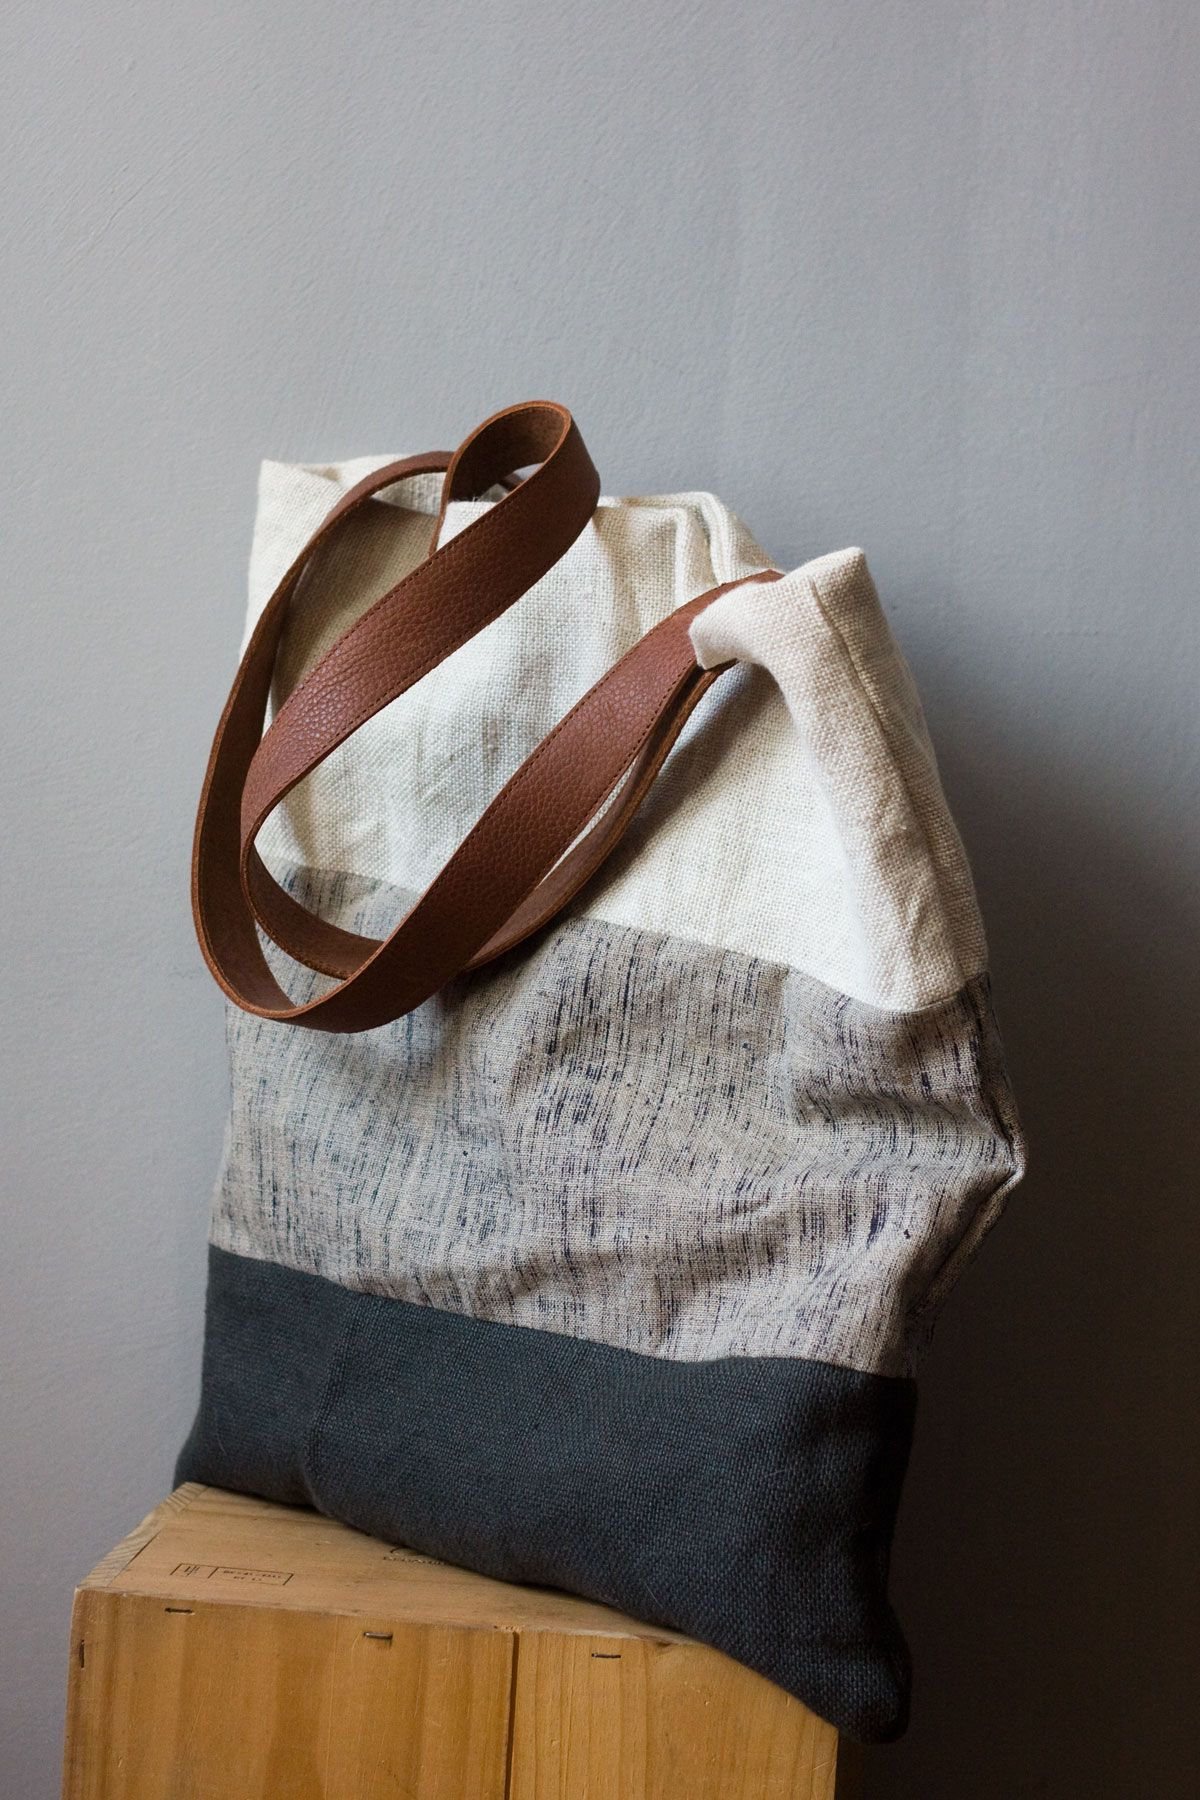 Lniana Torba W Pasy Ze Skorzanymi Raczkami Linen Bag Leather Handle Burlap Bag